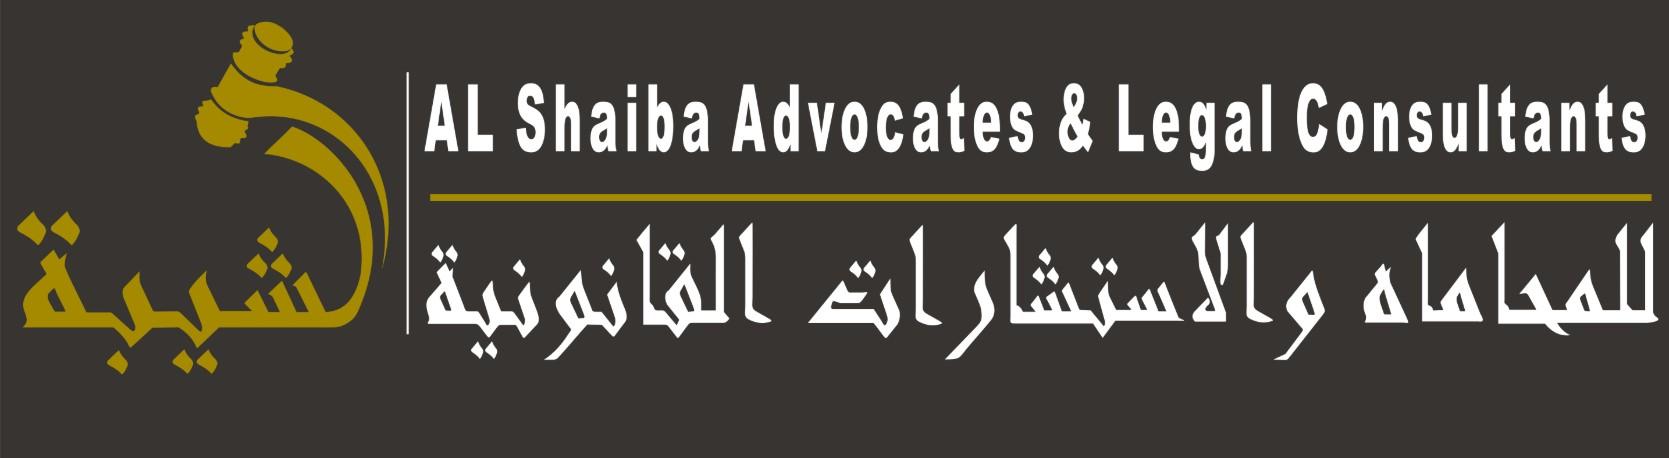 Al Shaiba Advocates & Legal Consultants